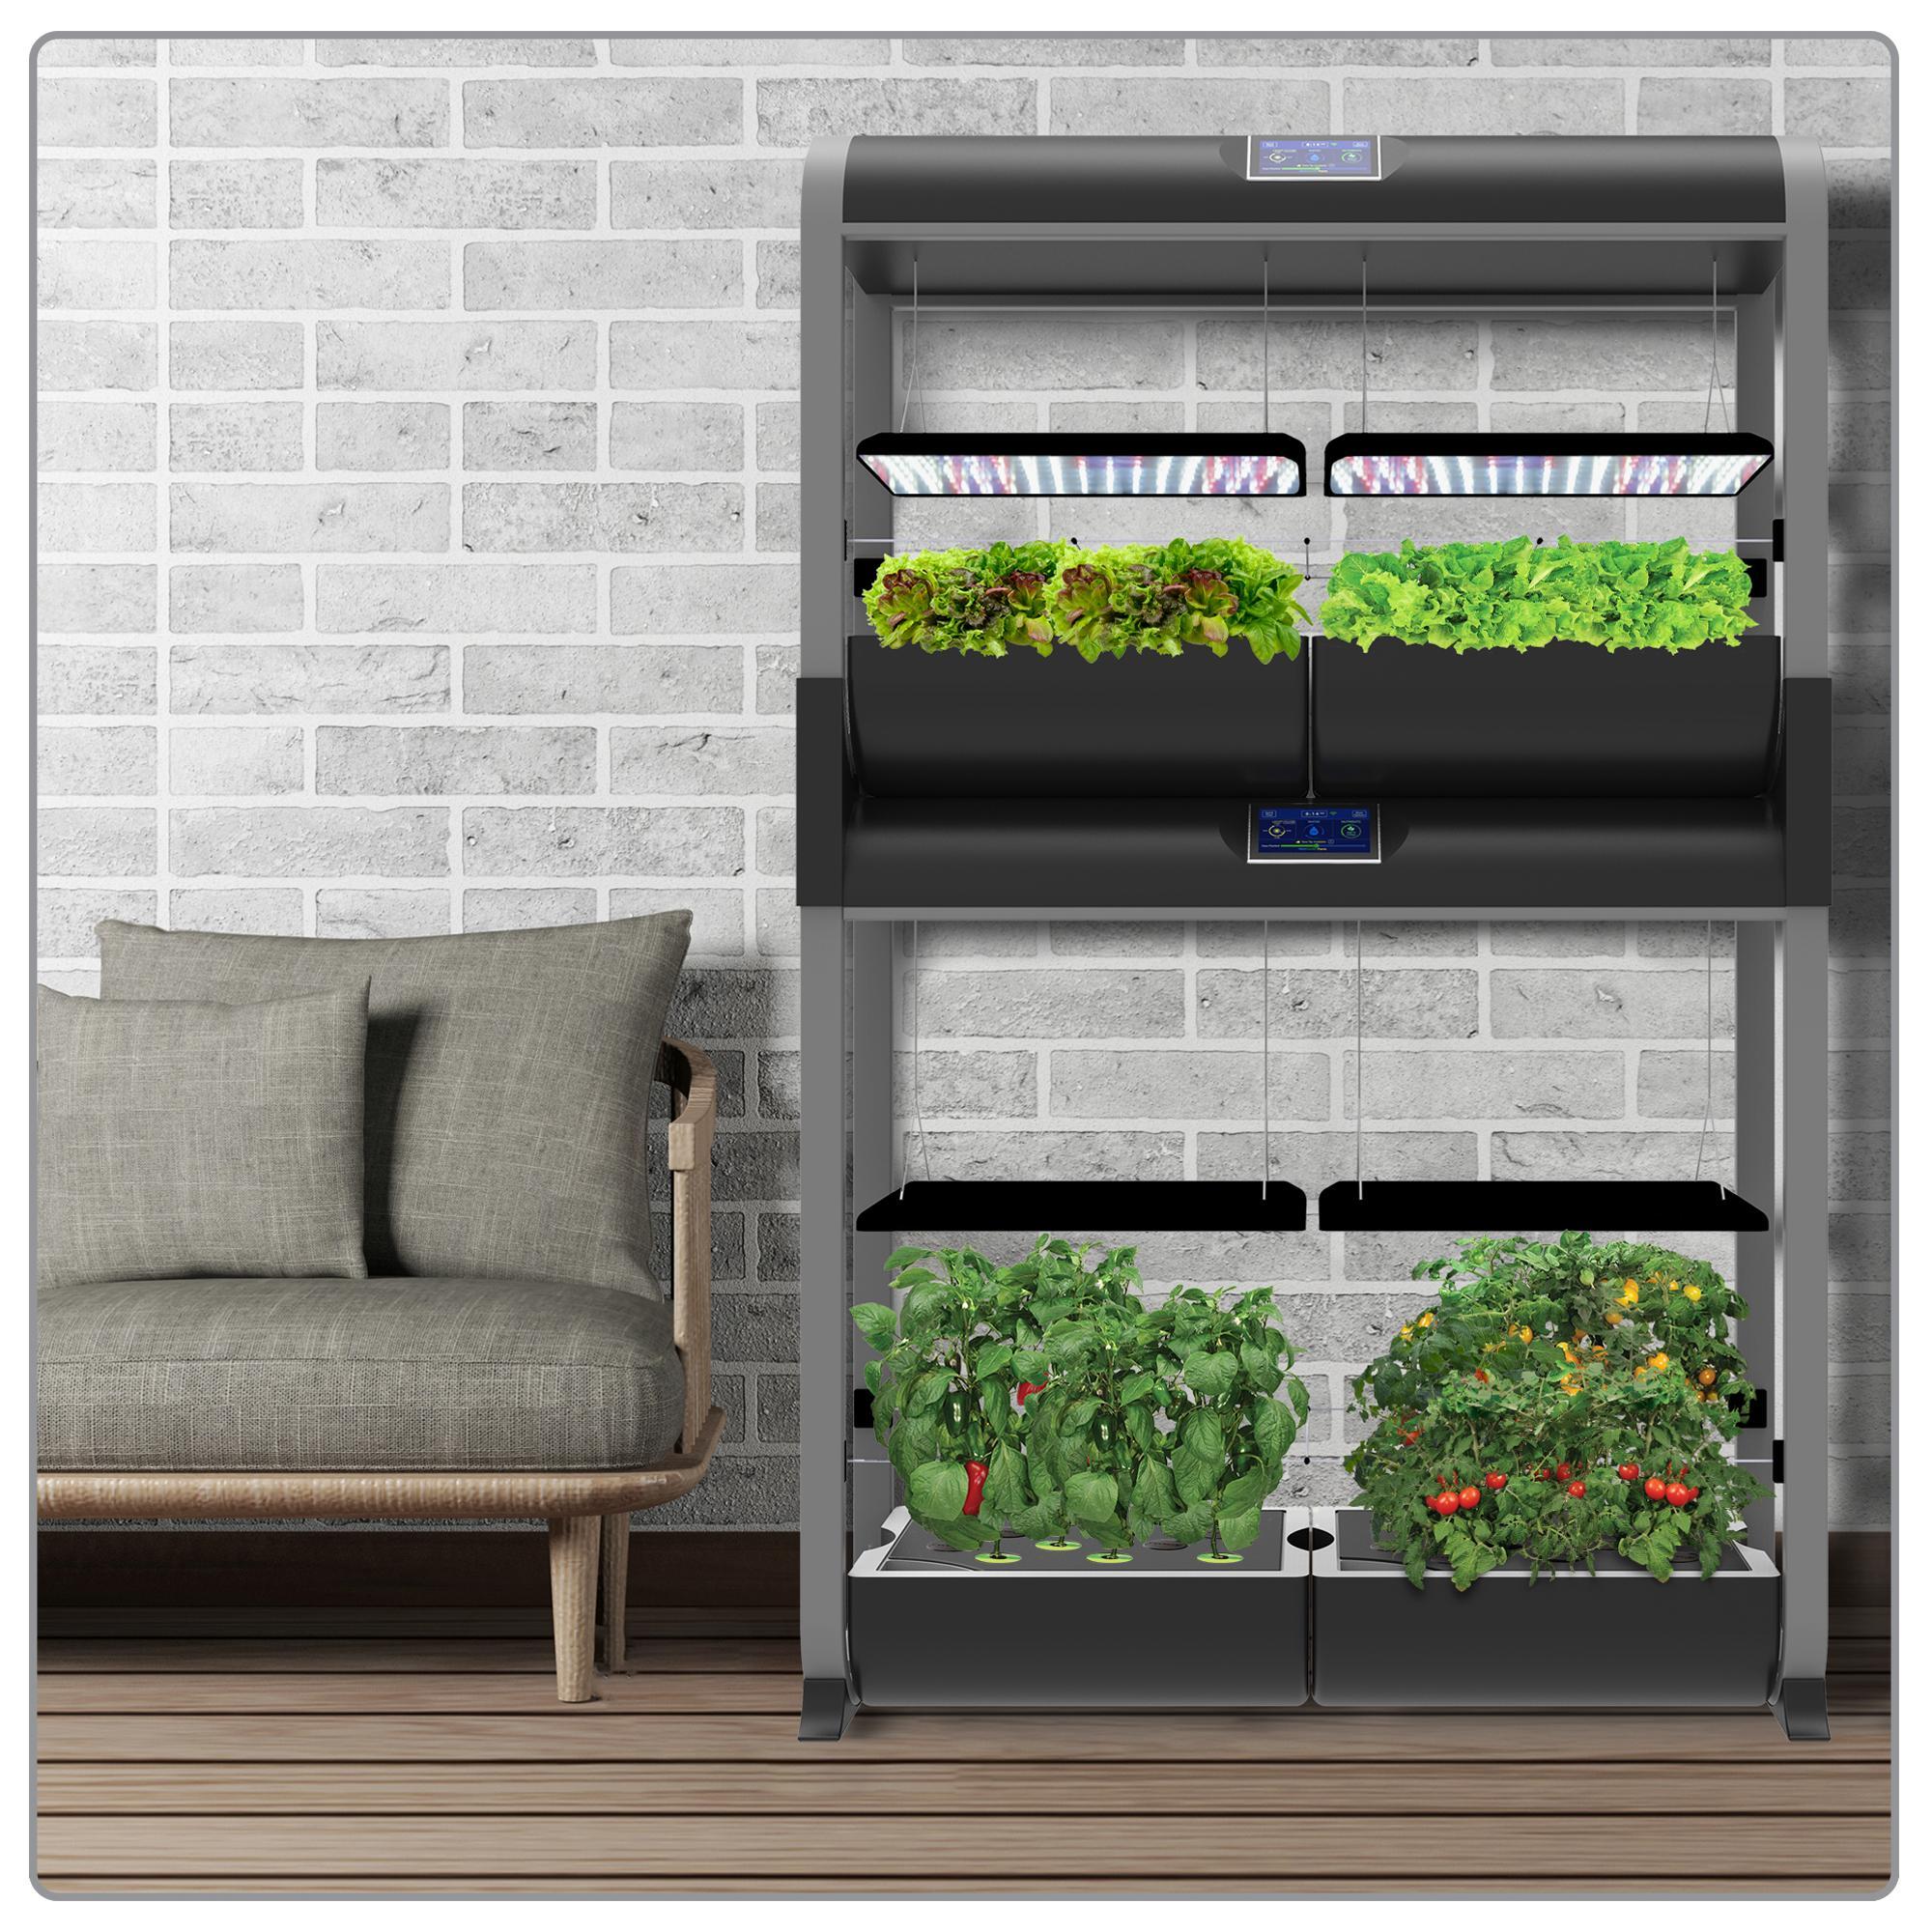 Amazon.com : AeroGarden Farm Plus Hydroponic Garden, 24